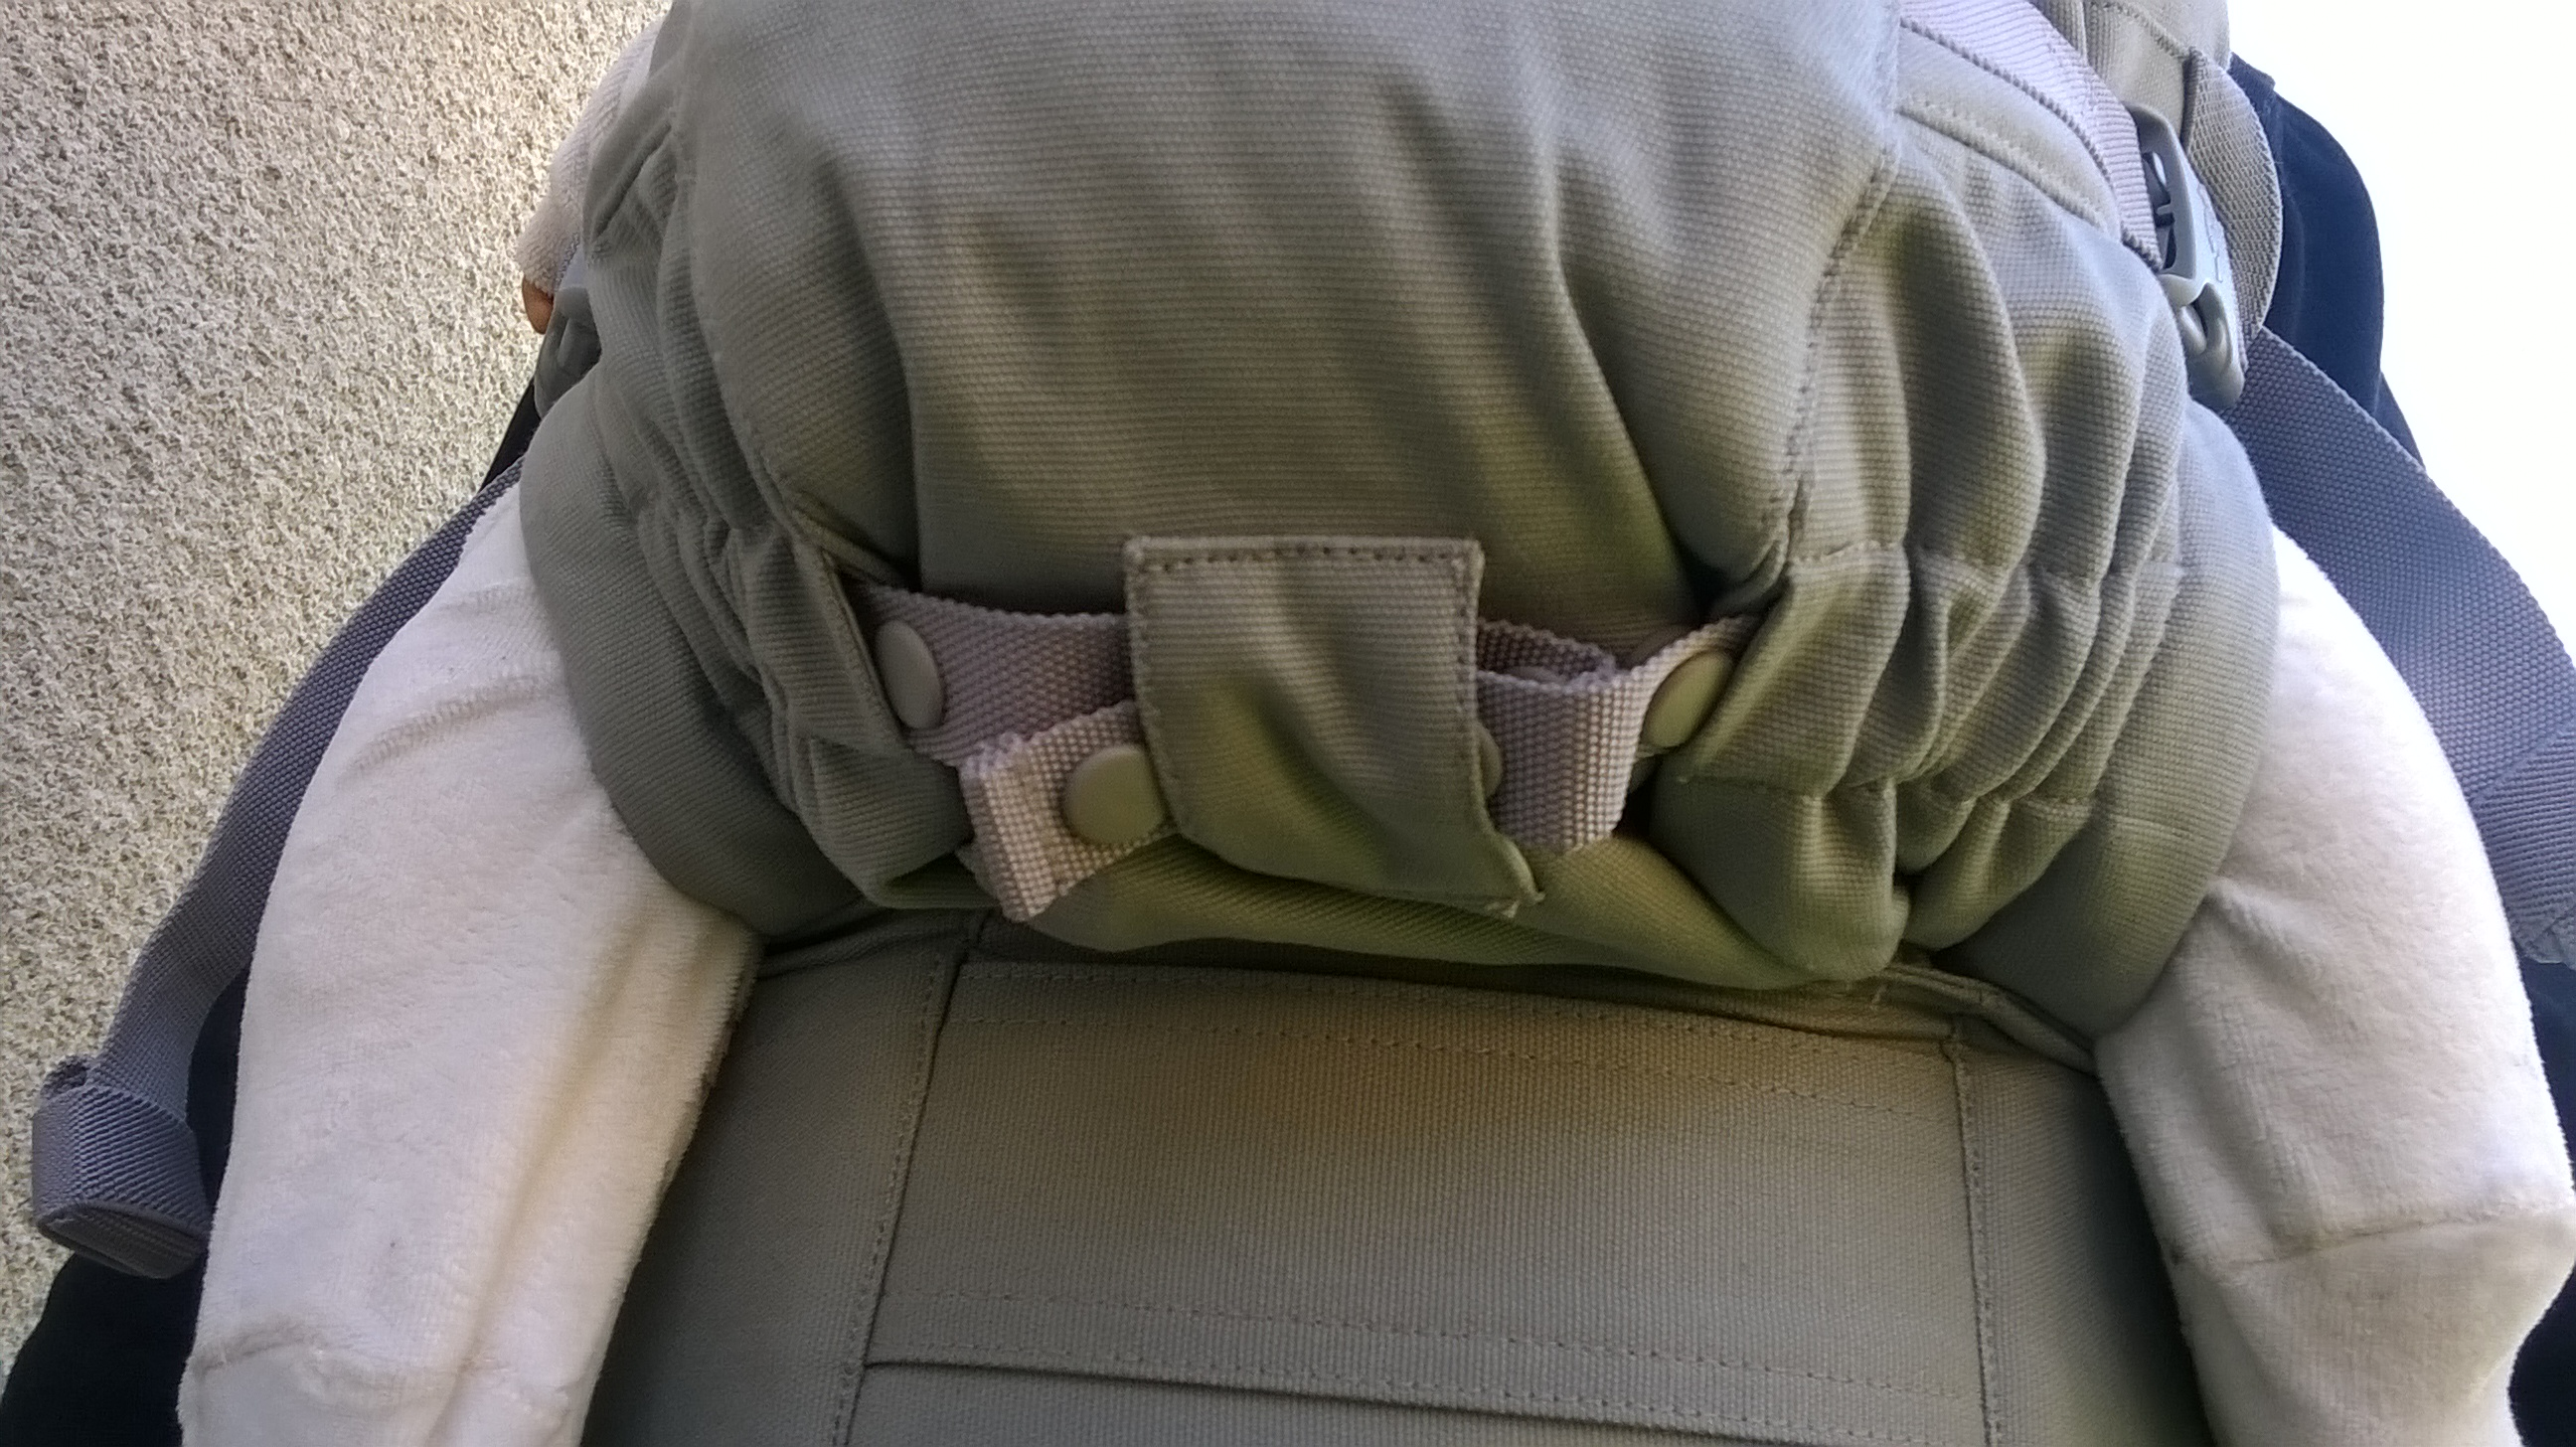 Ergobaby Adapt réglage assise par pressions